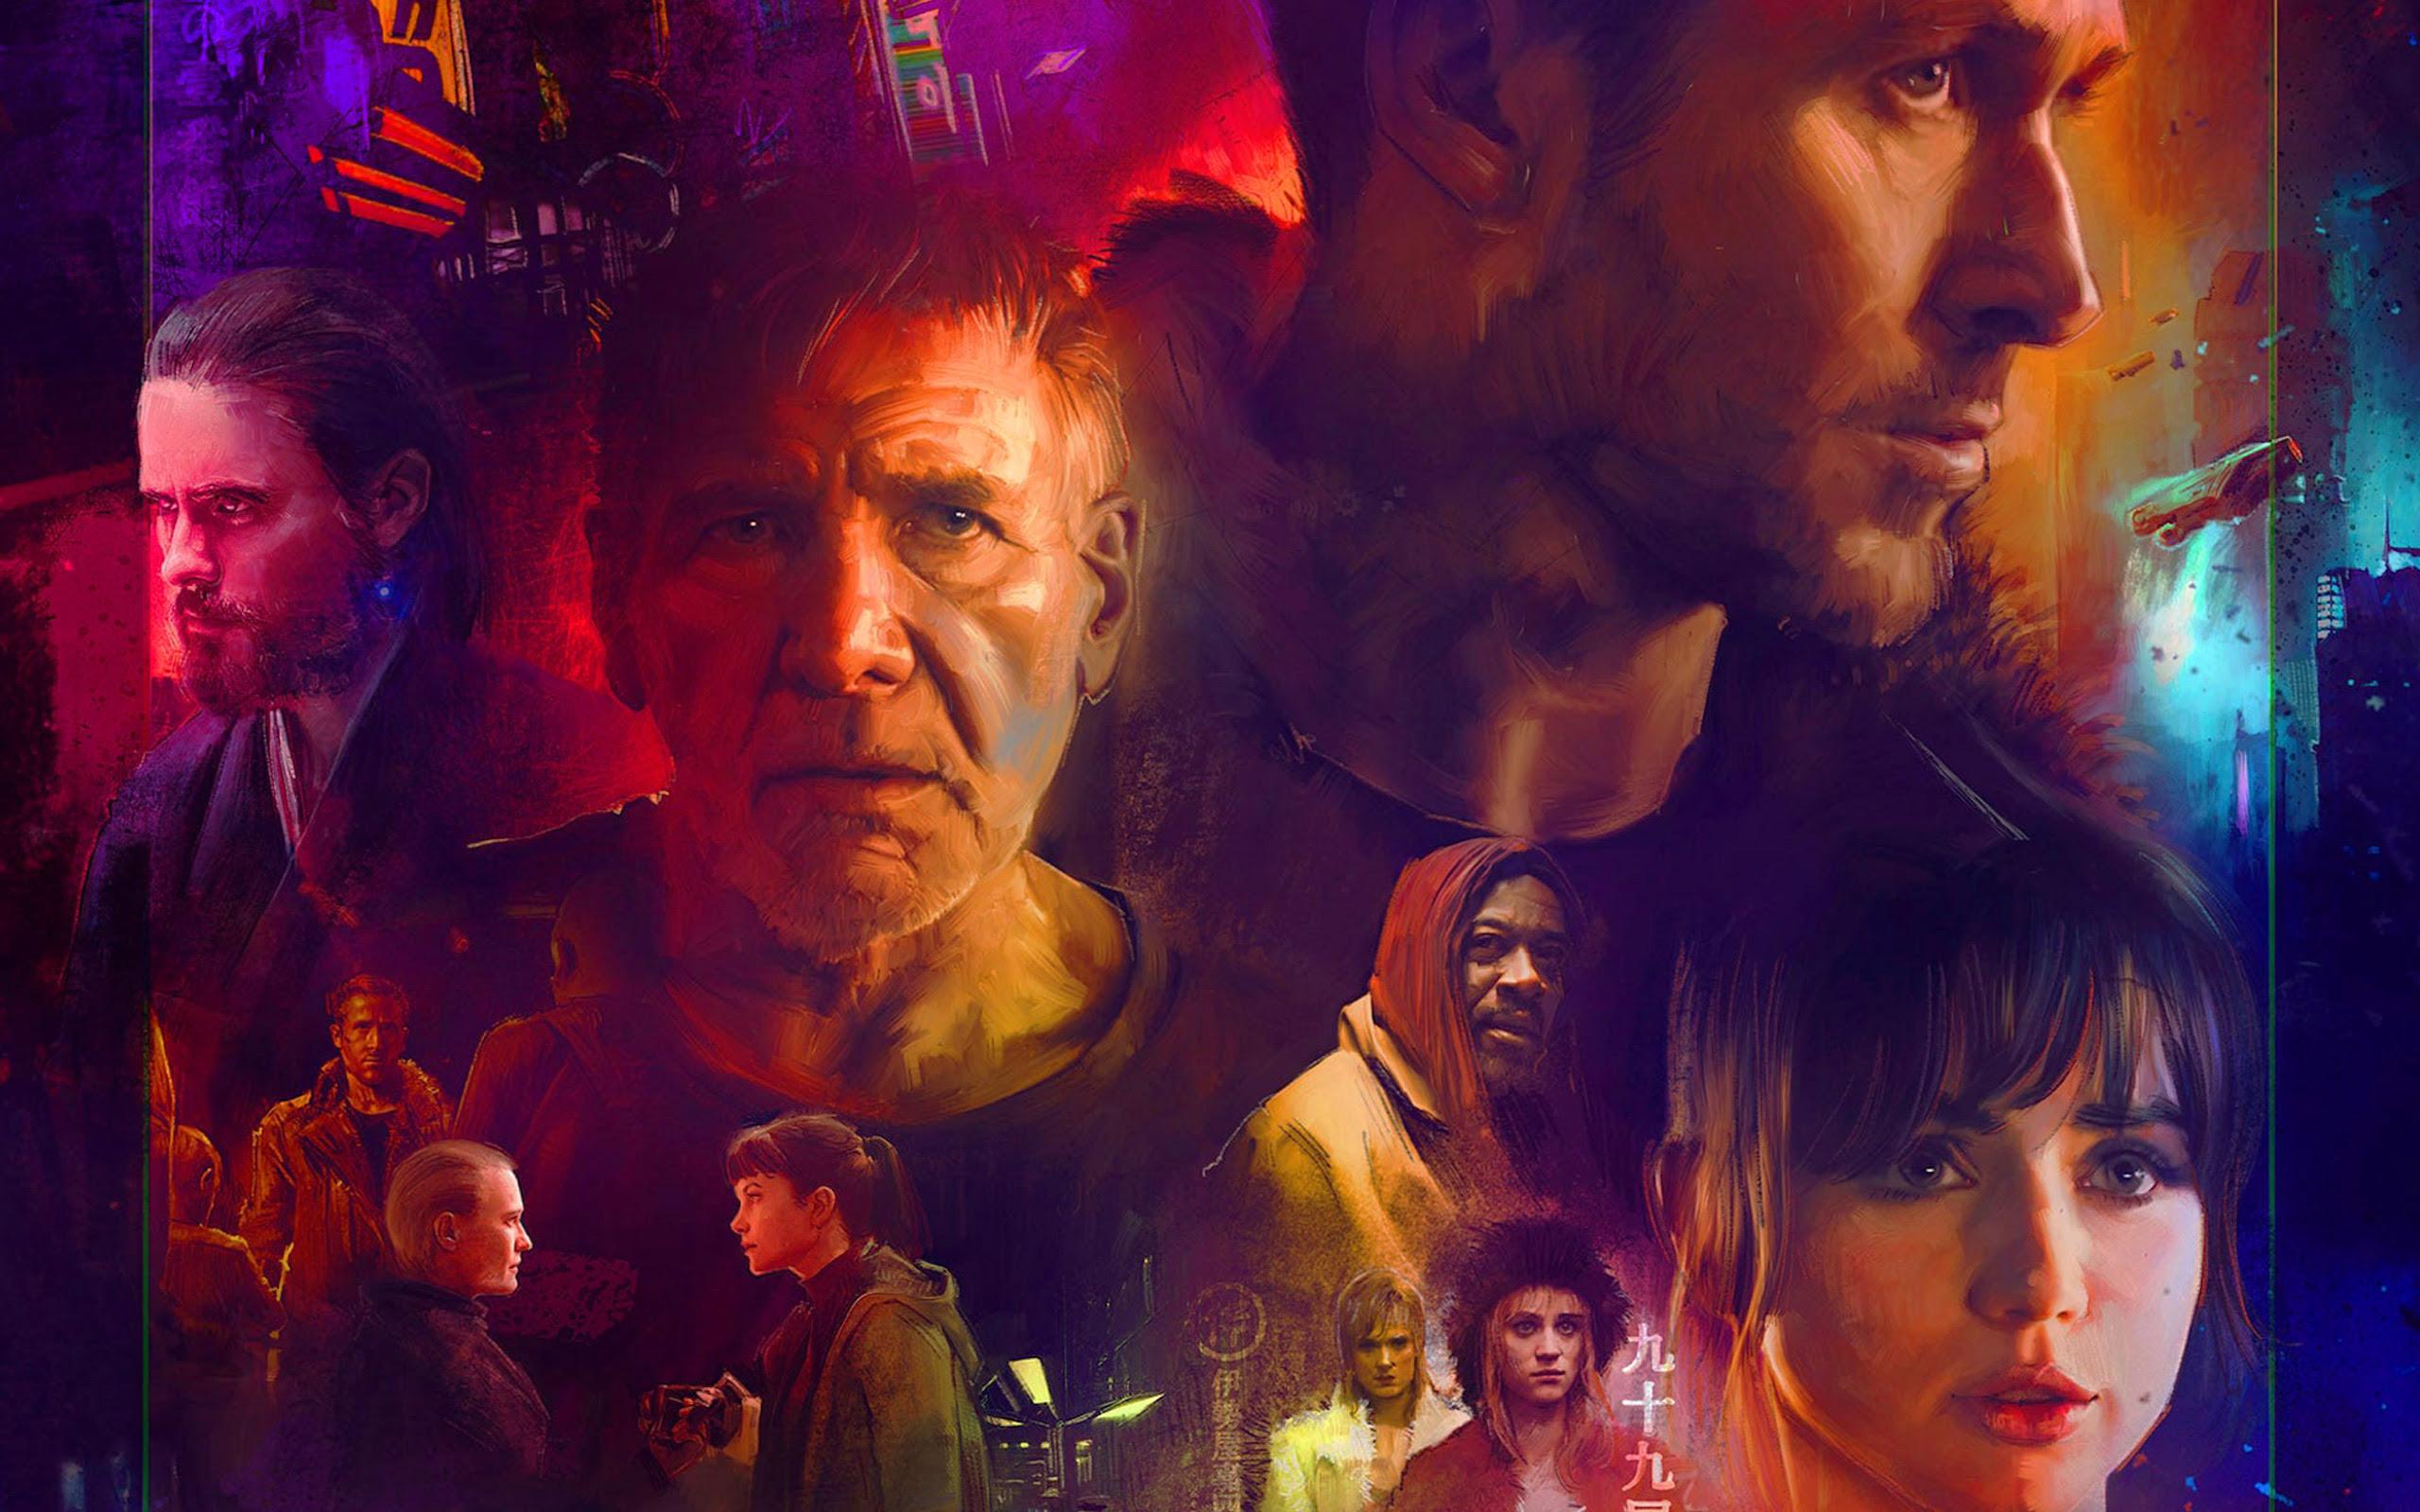 Blade Runner 2049 Fanart, HD Movies, 4k Wallpapers, Images ...